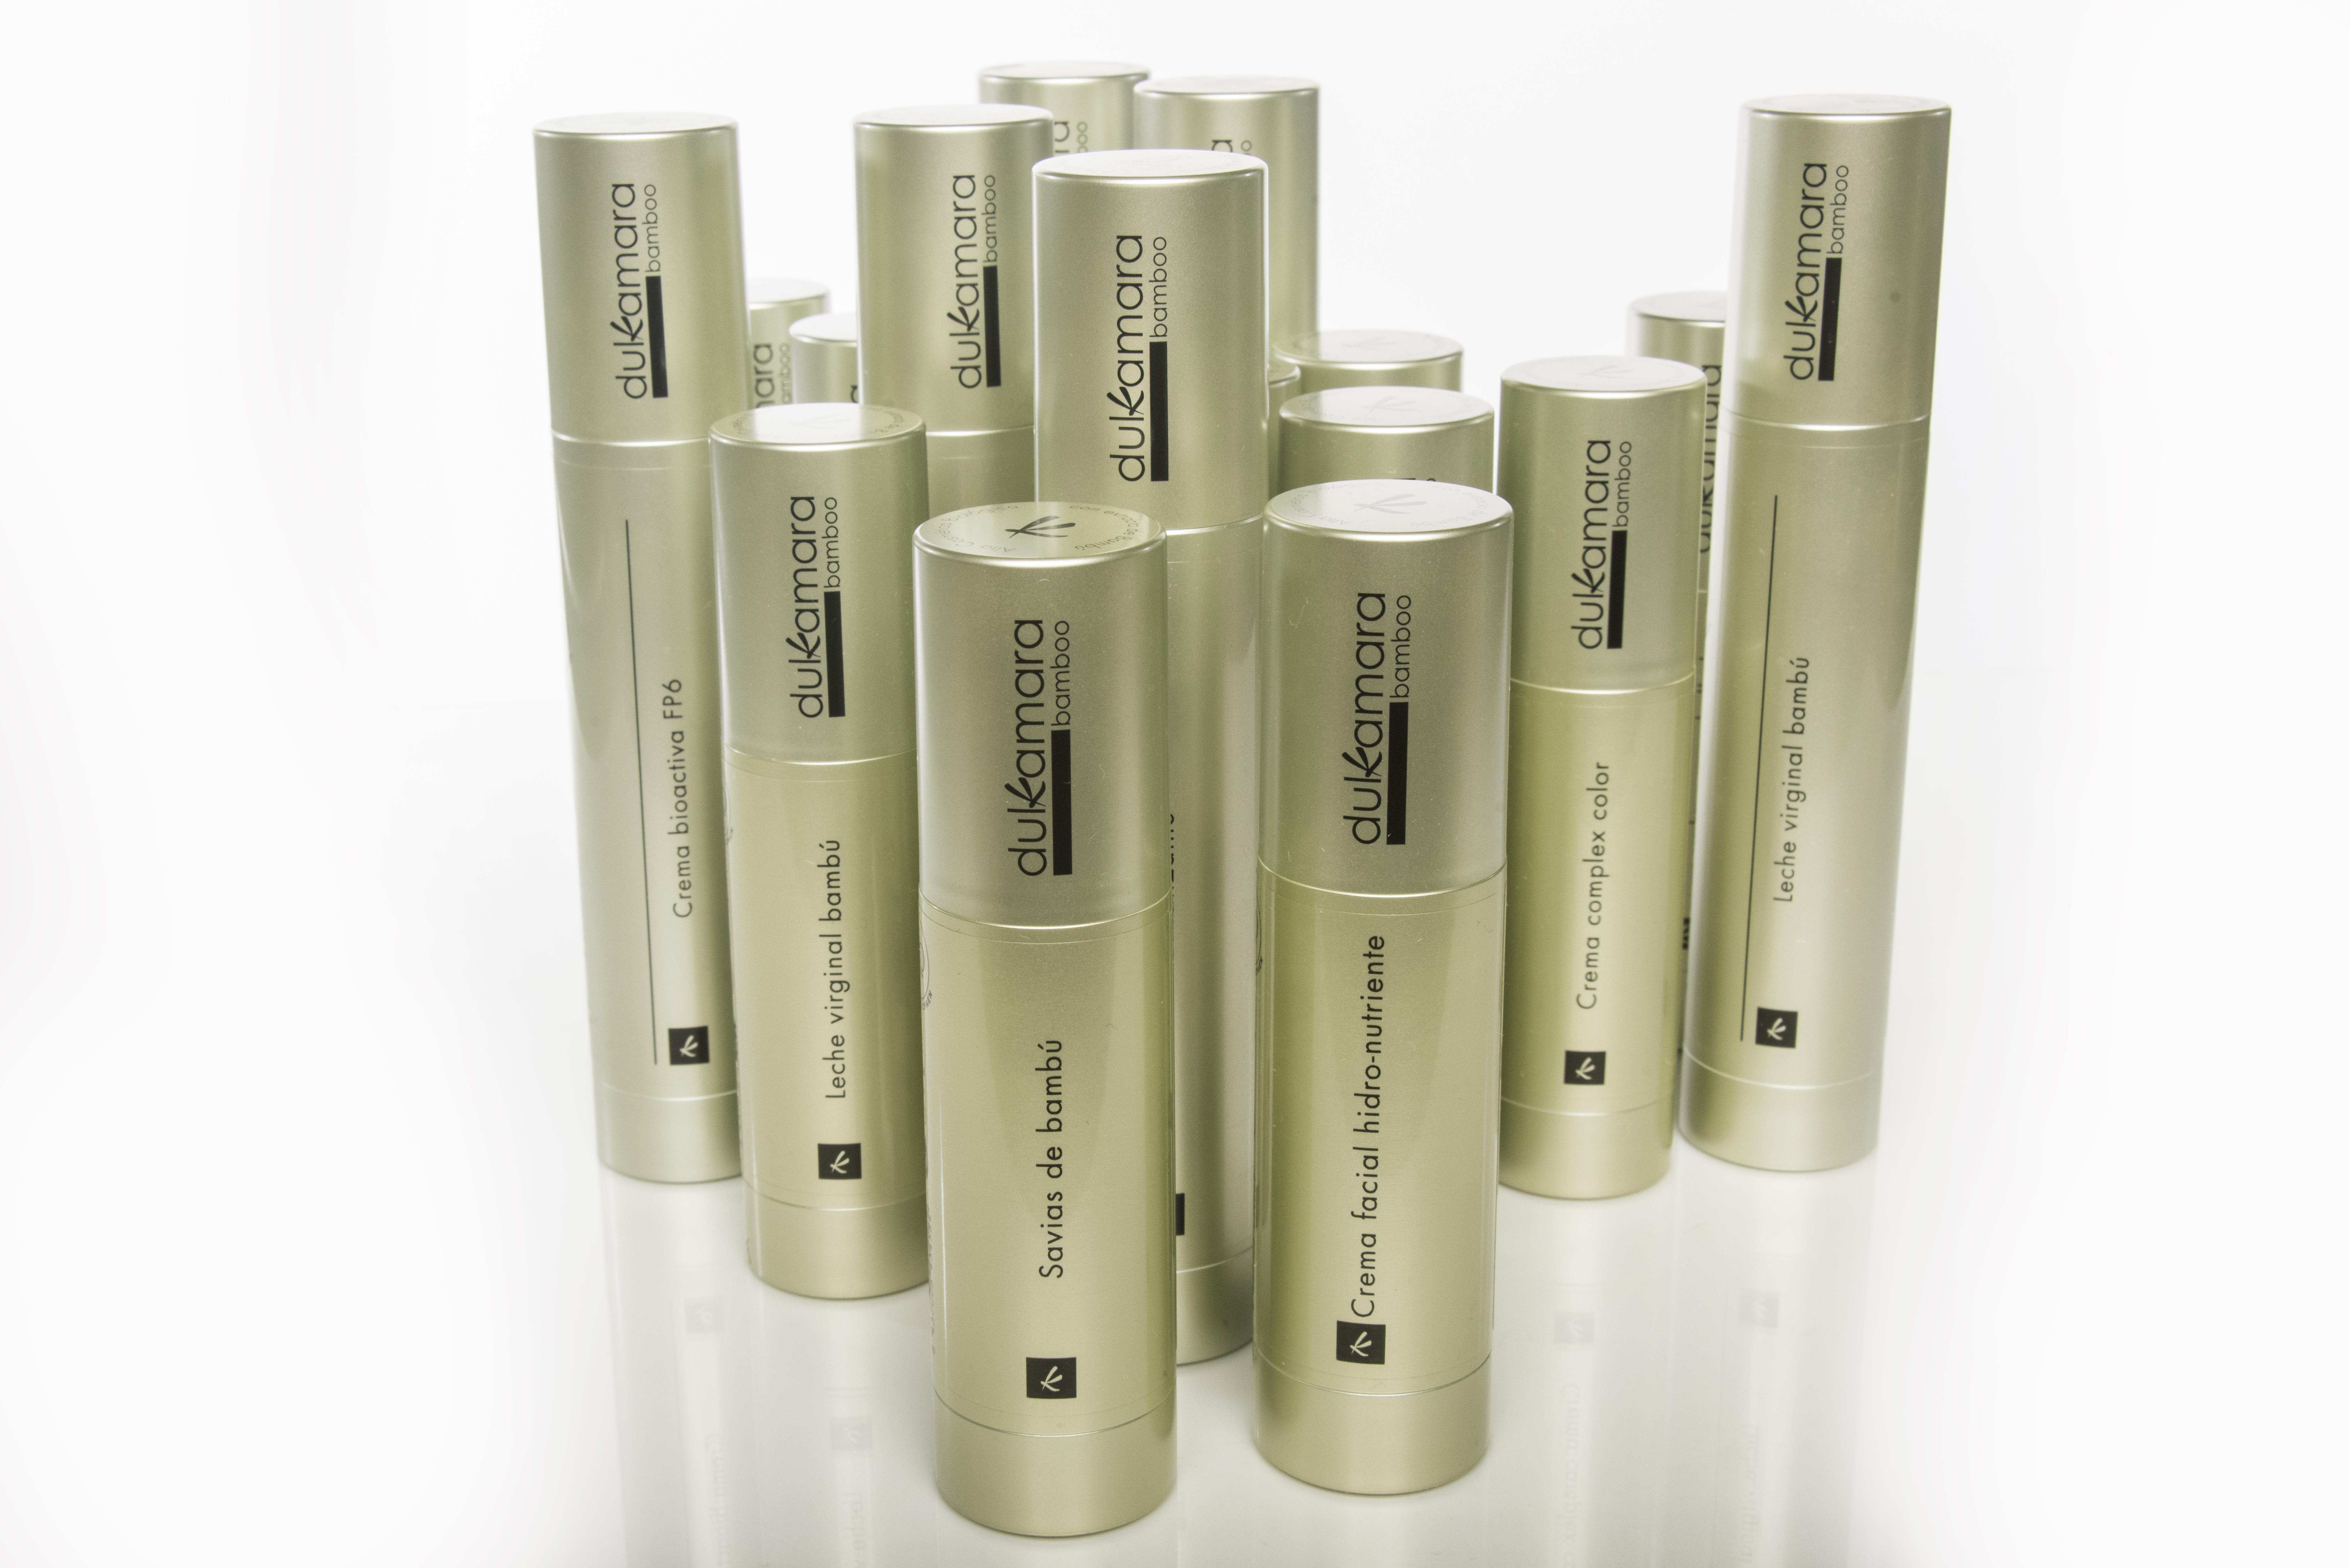 Botellas-Dulkamara-bamboo